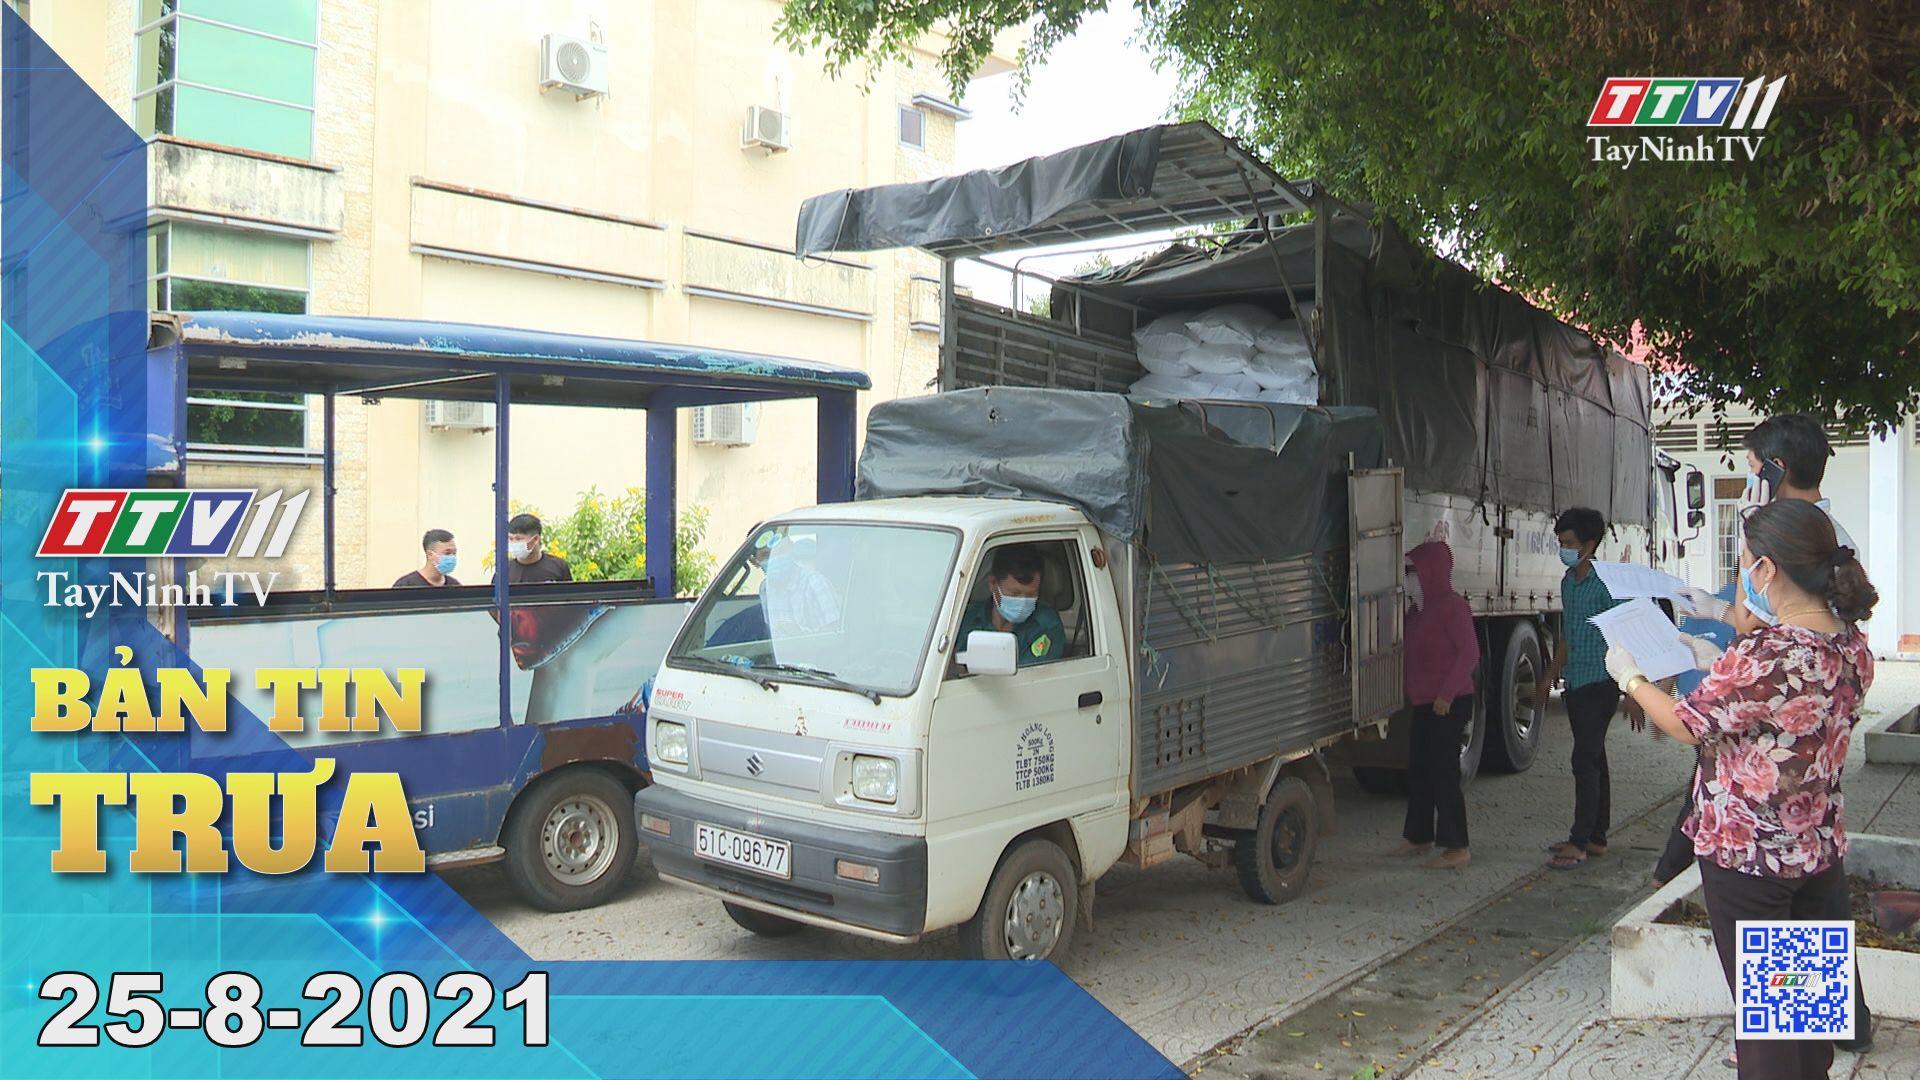 Bản tin trưa 25-8-2021 | Tin tức hôm nay | TayNinhTV